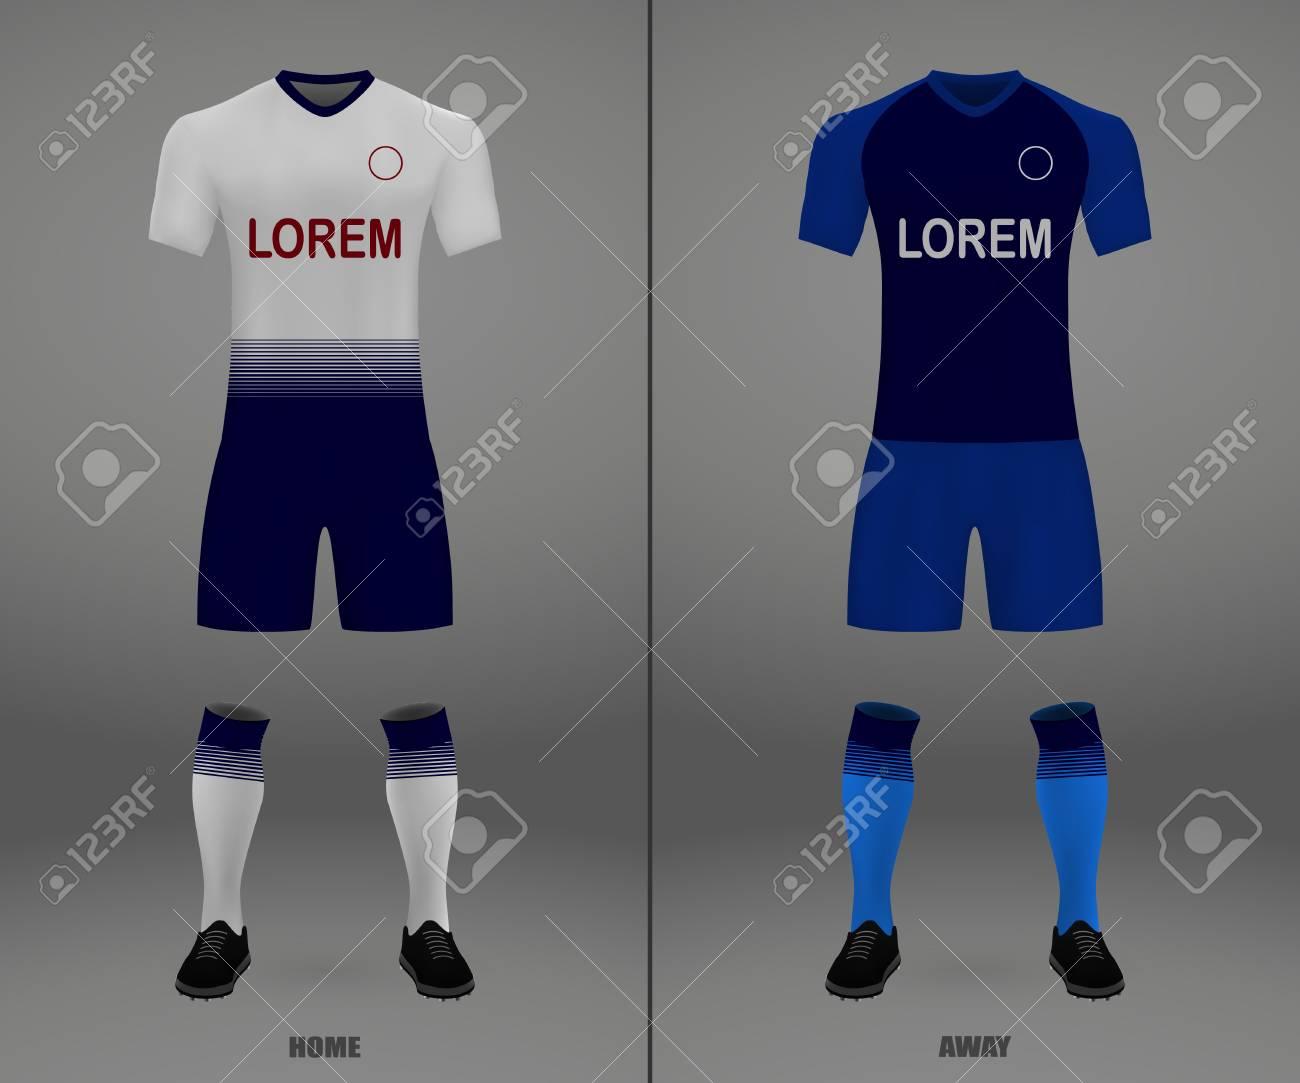 factory price 70f87 6a272 football kit Tottenham Hotspur 2018-19, shirt template for soccer..